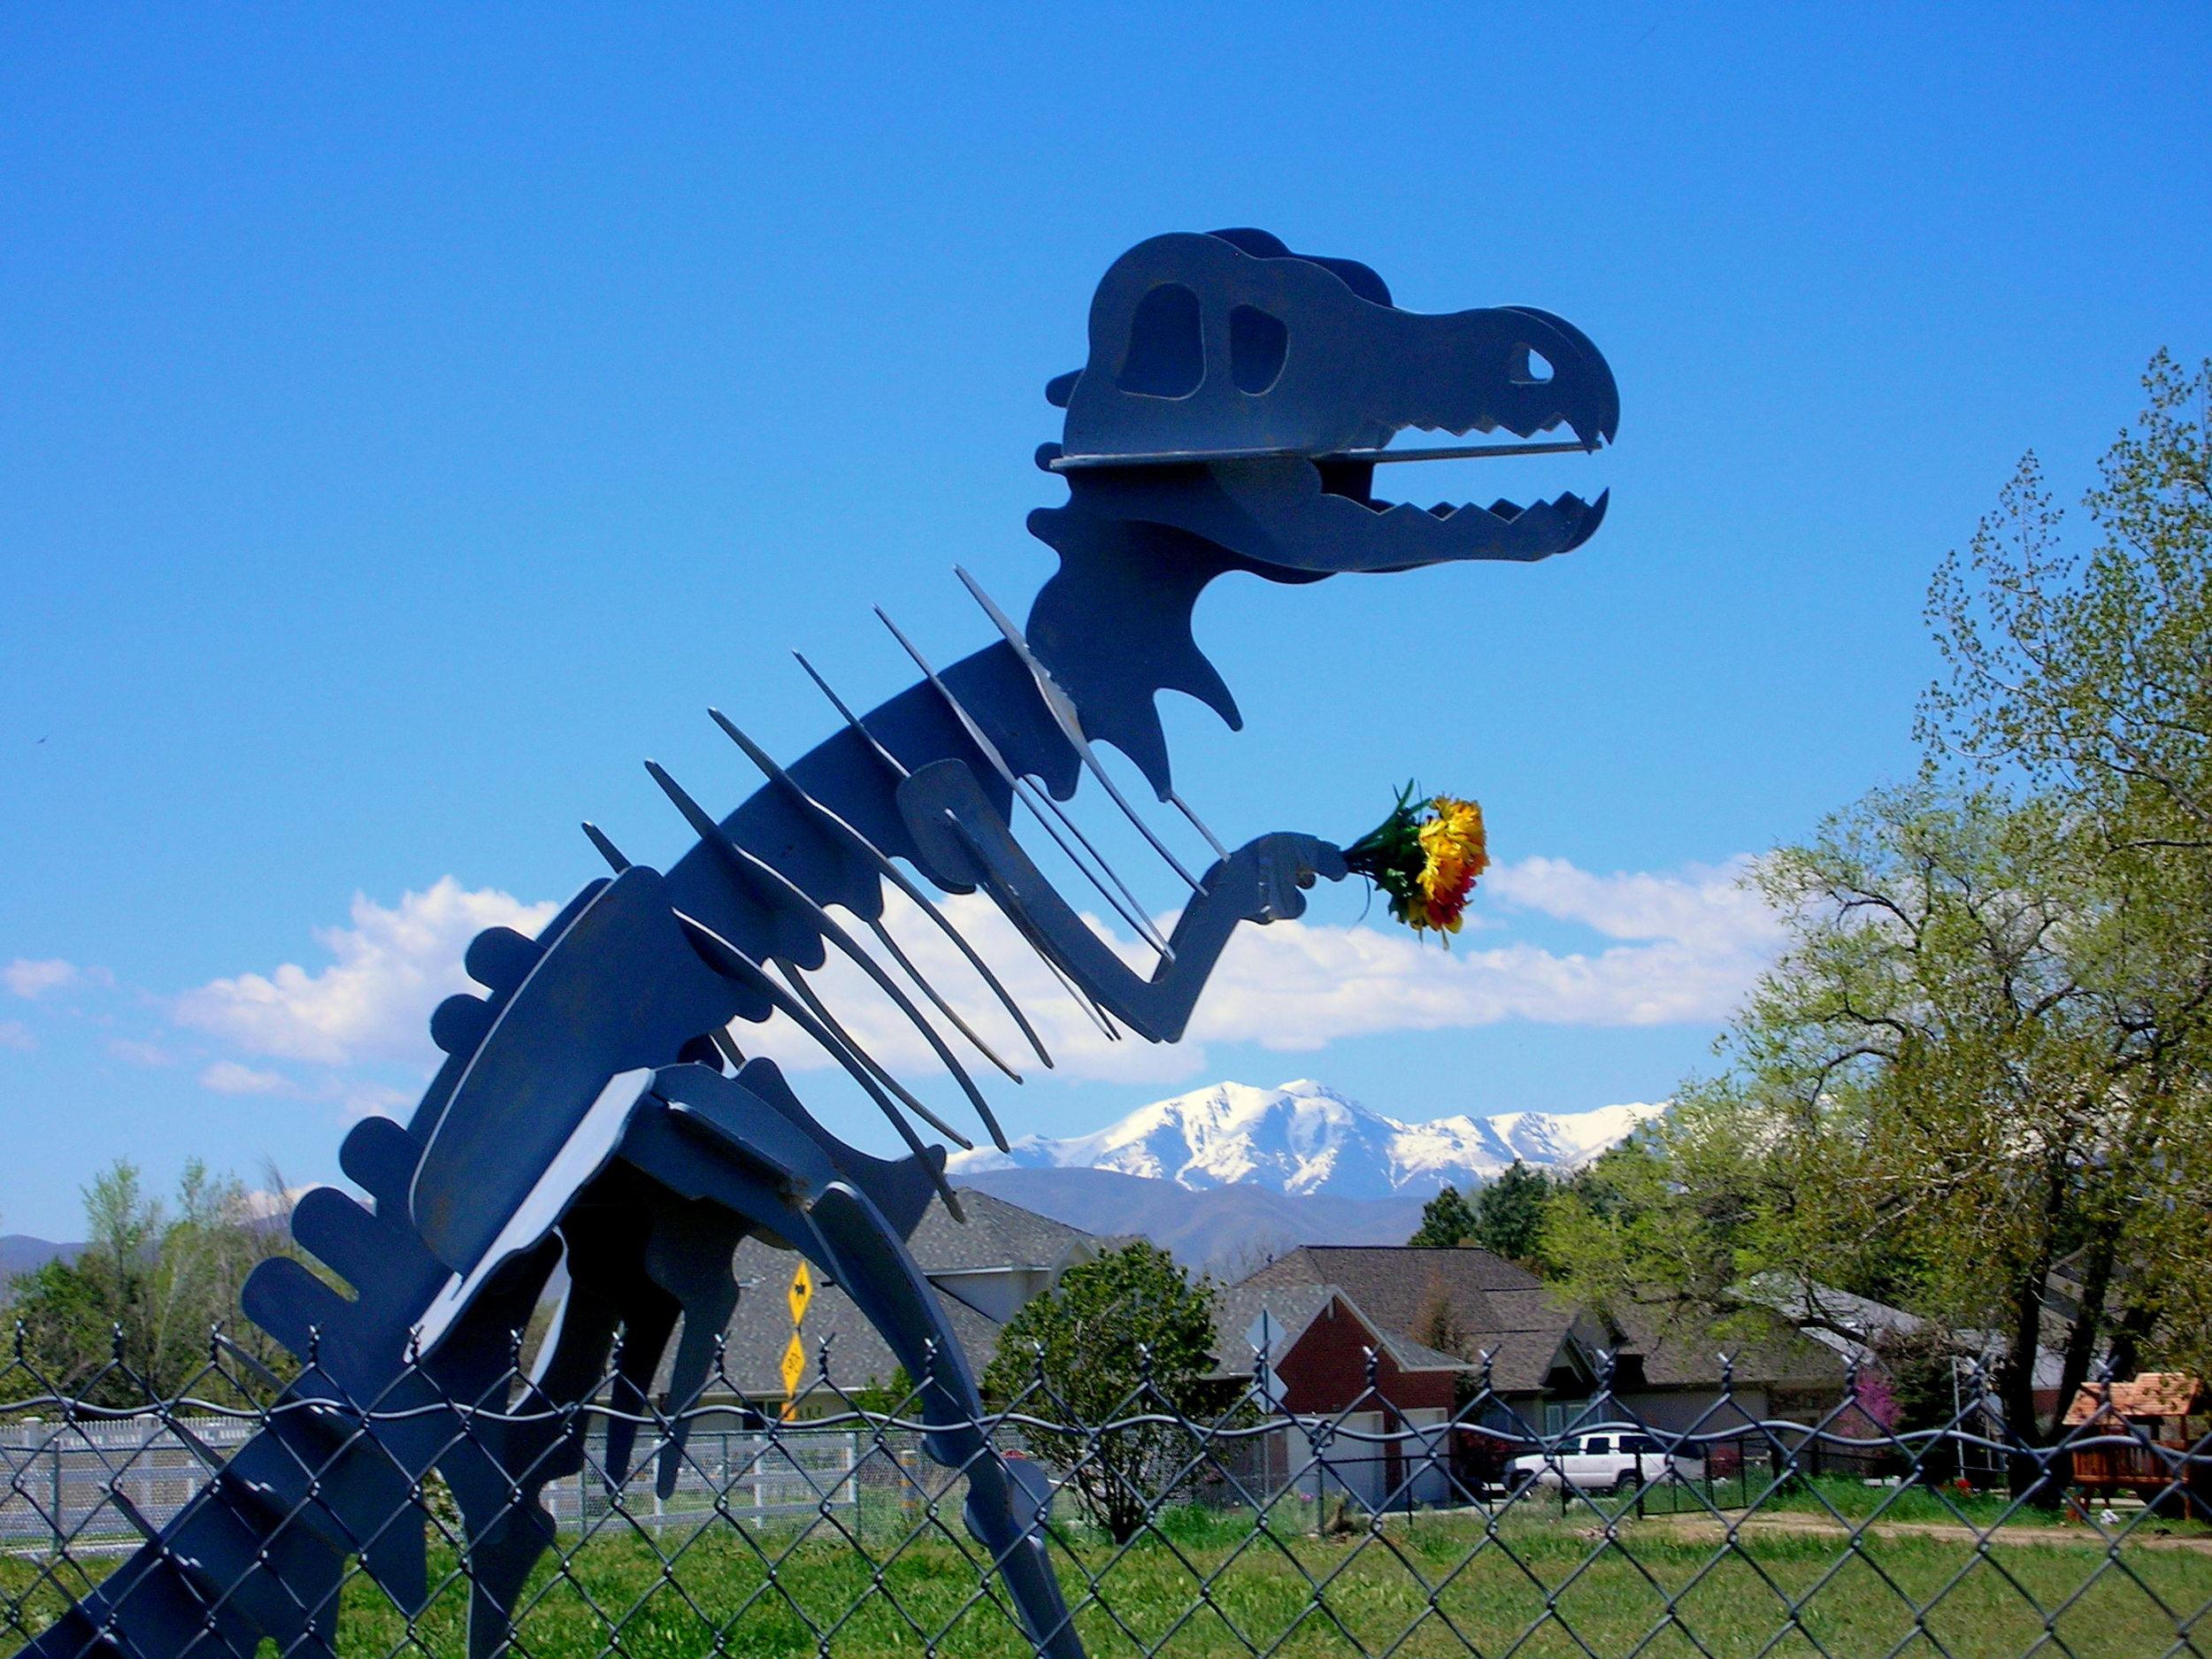 prehistoric neighbor looking for love. draper, utah